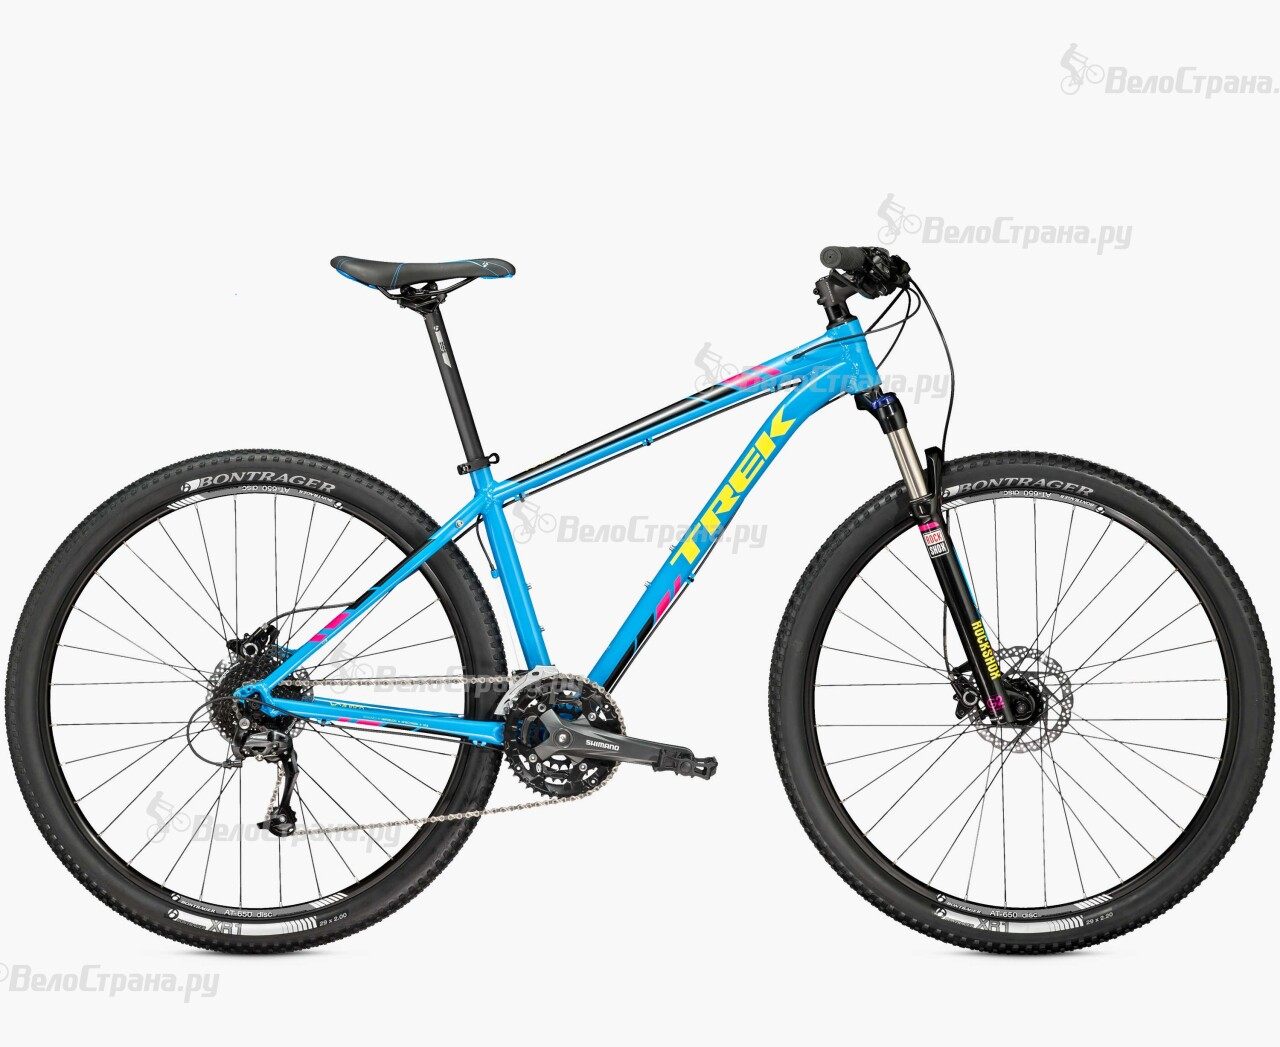 Велосипед Trek X-Caliber 7 27,5 (2016) trek x caliber 9 27 5 2015